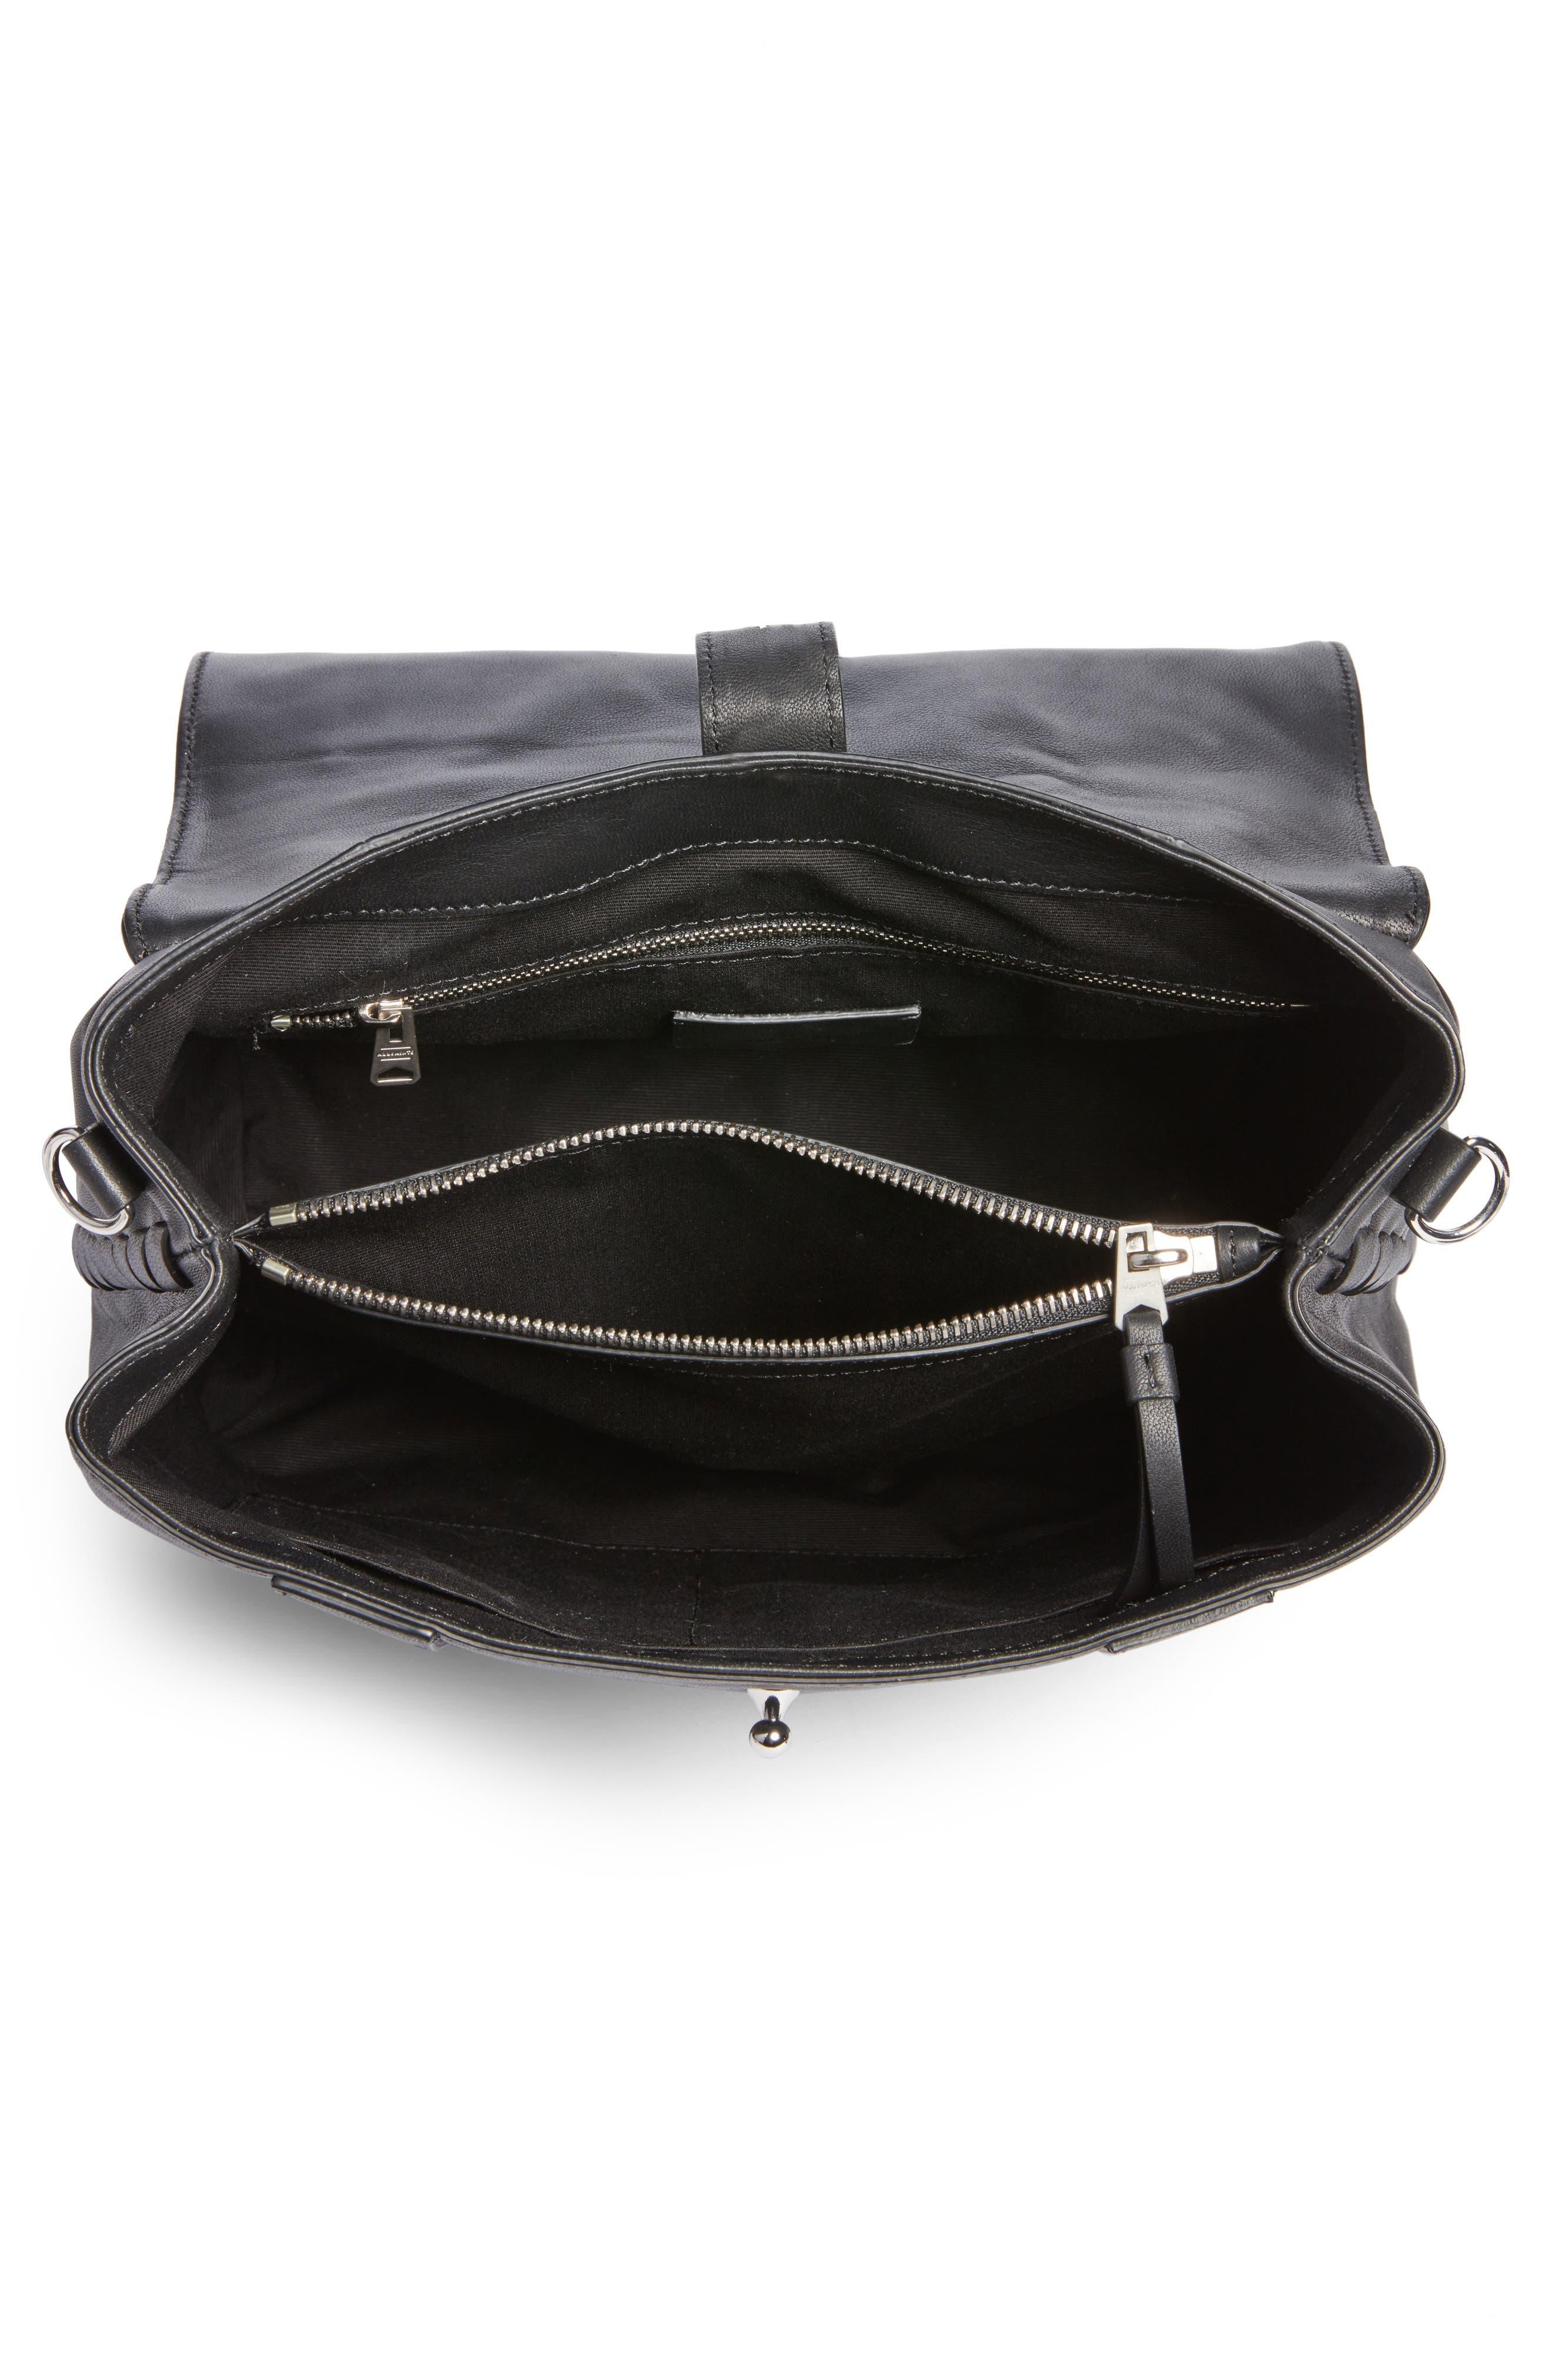 ALLSAINTS, Fin Leather Backpack, Alternate thumbnail 4, color, BLACK